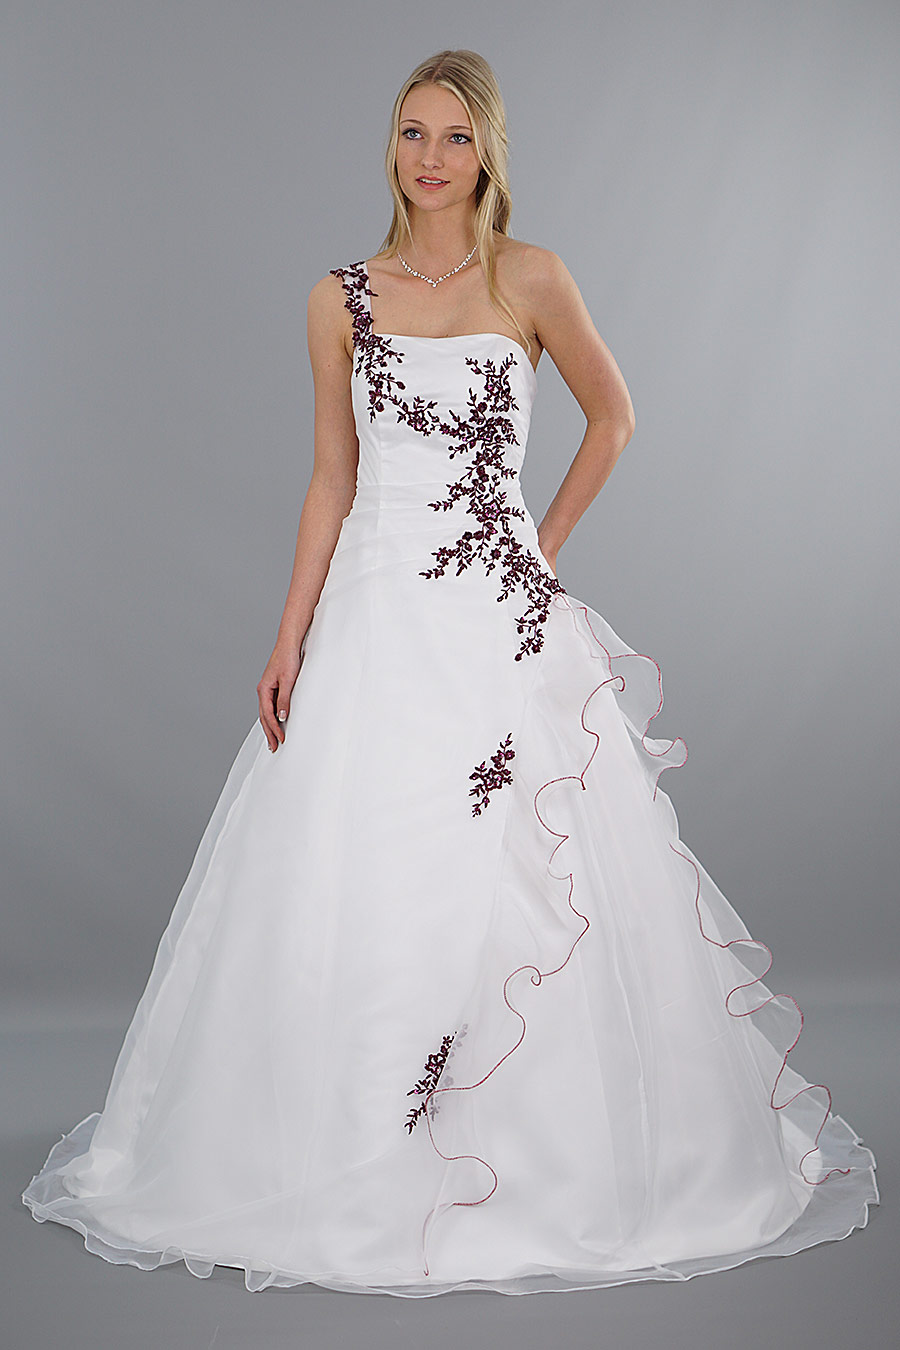 Brautkleid Modell Lilly - rot bestickt | Schmetterling ...